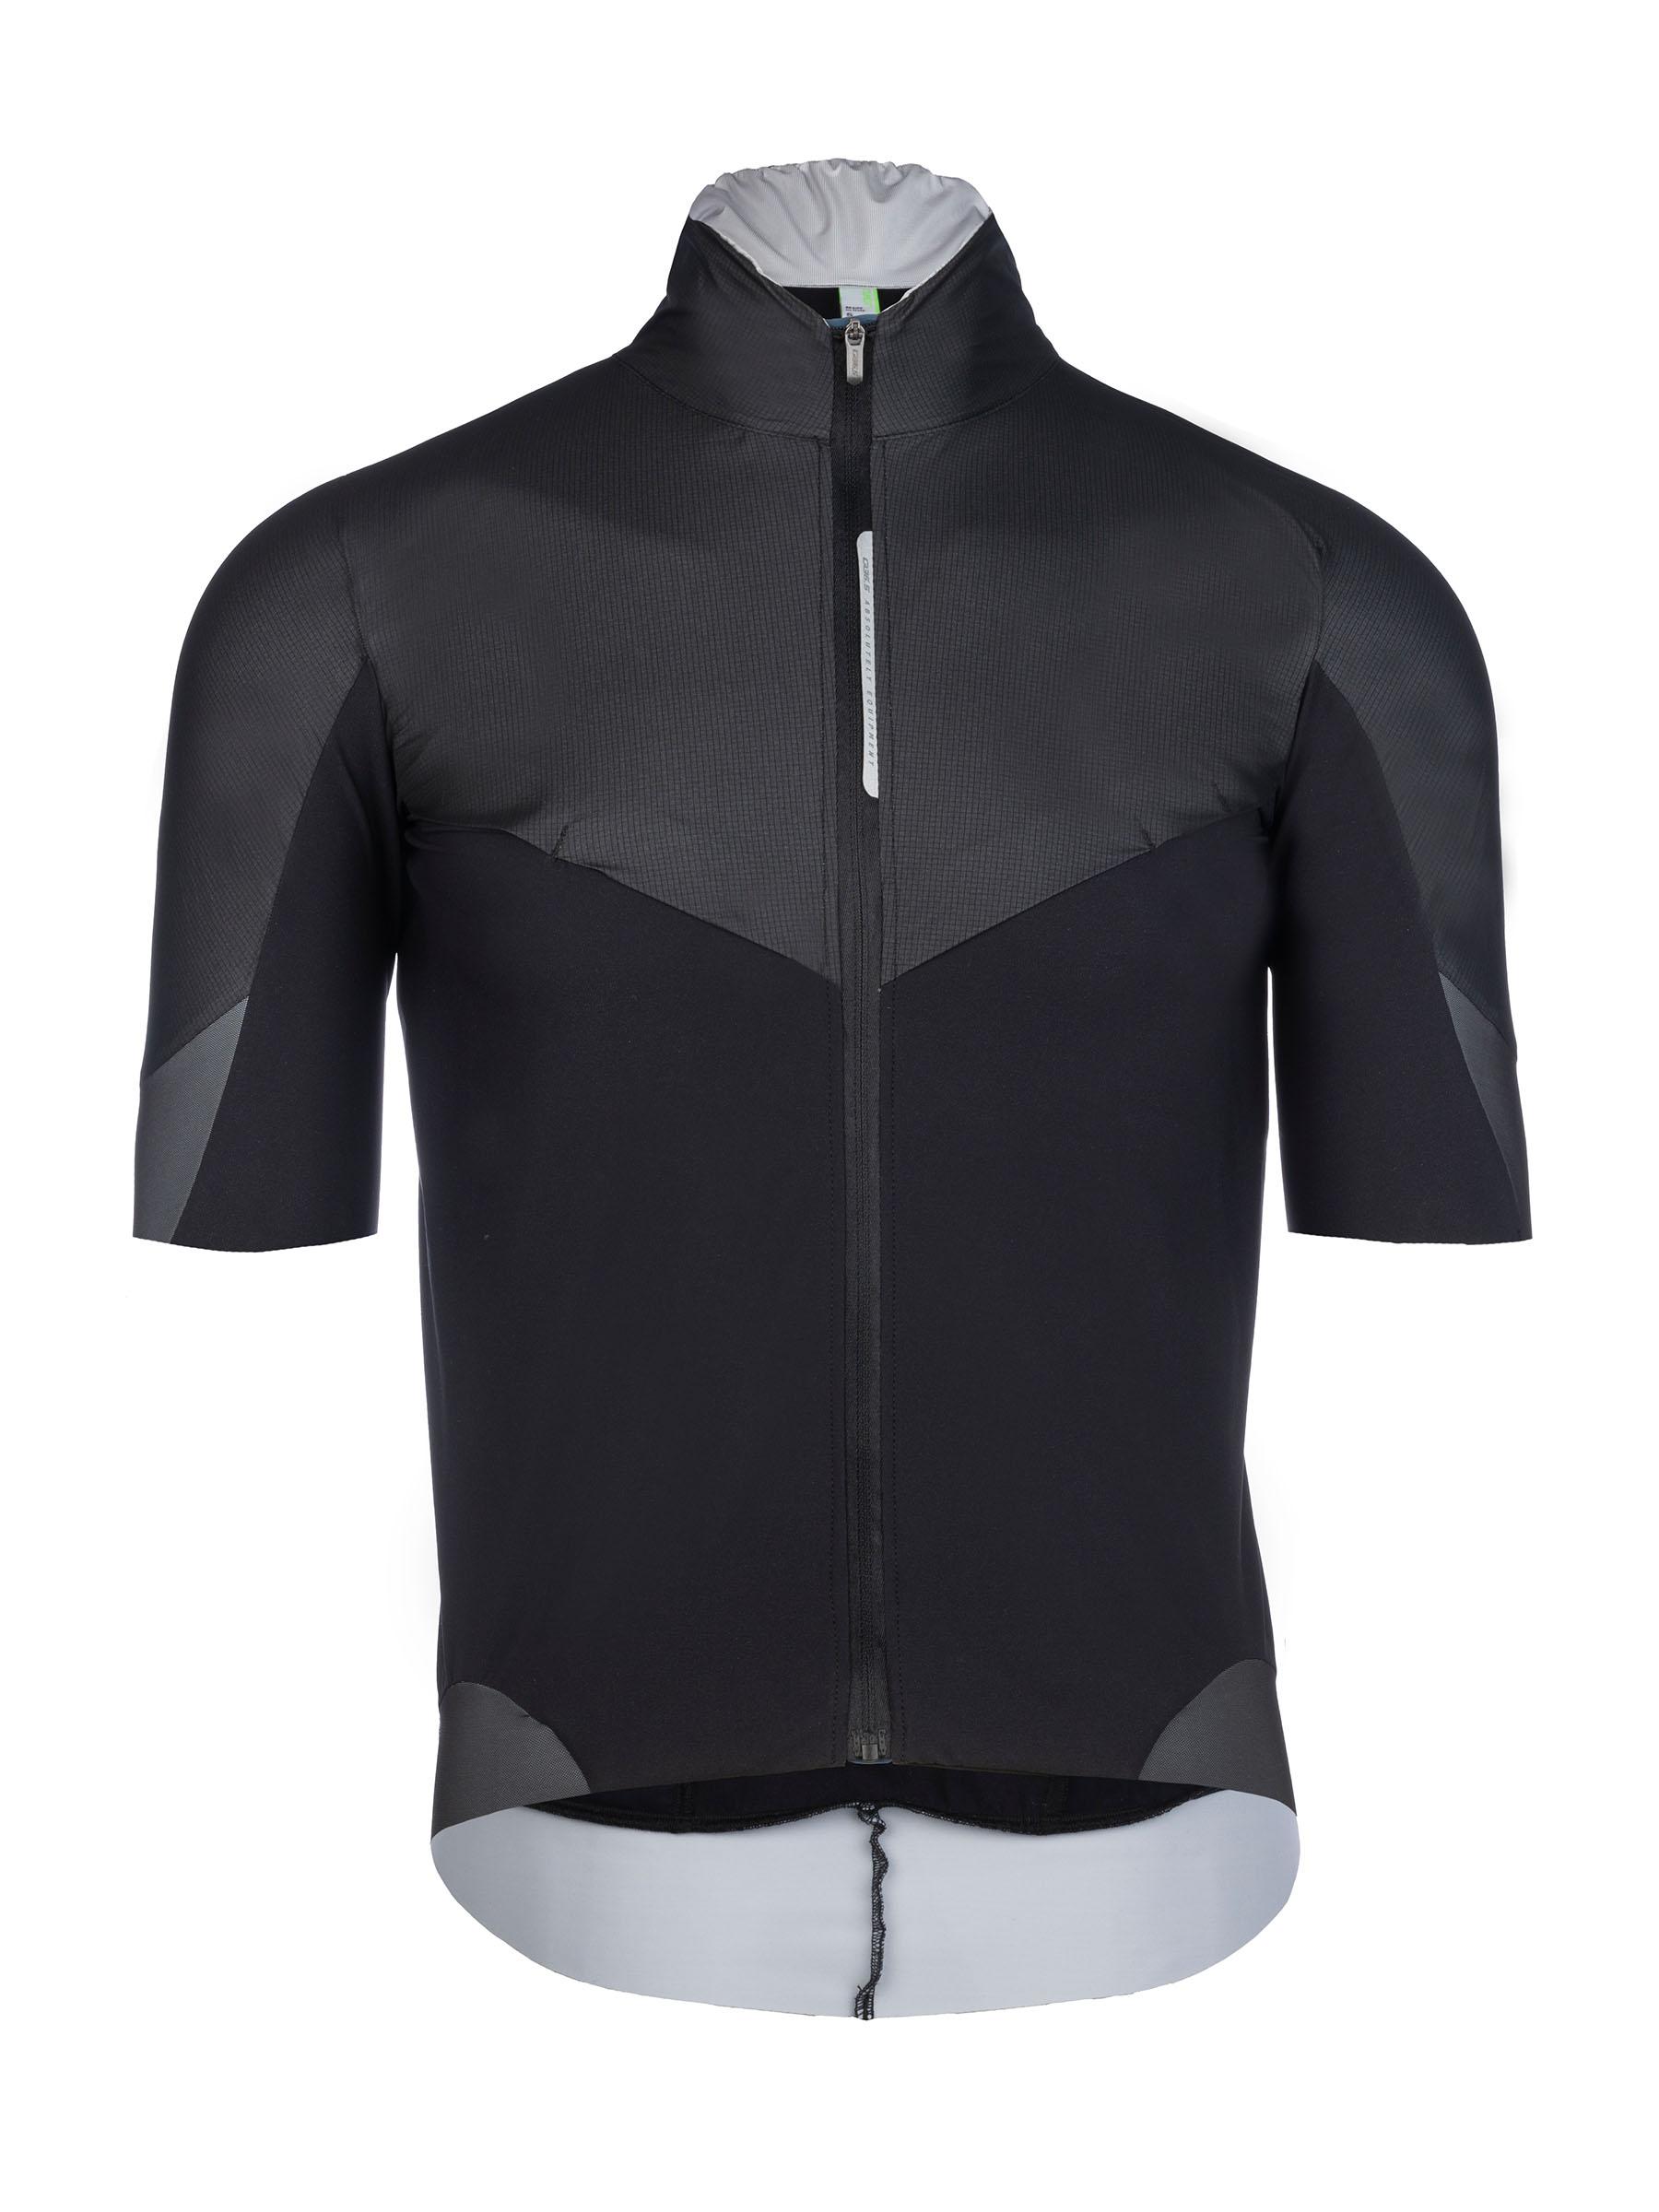 Cycling rain jacket Bat Shell Q36.5 - 064.2